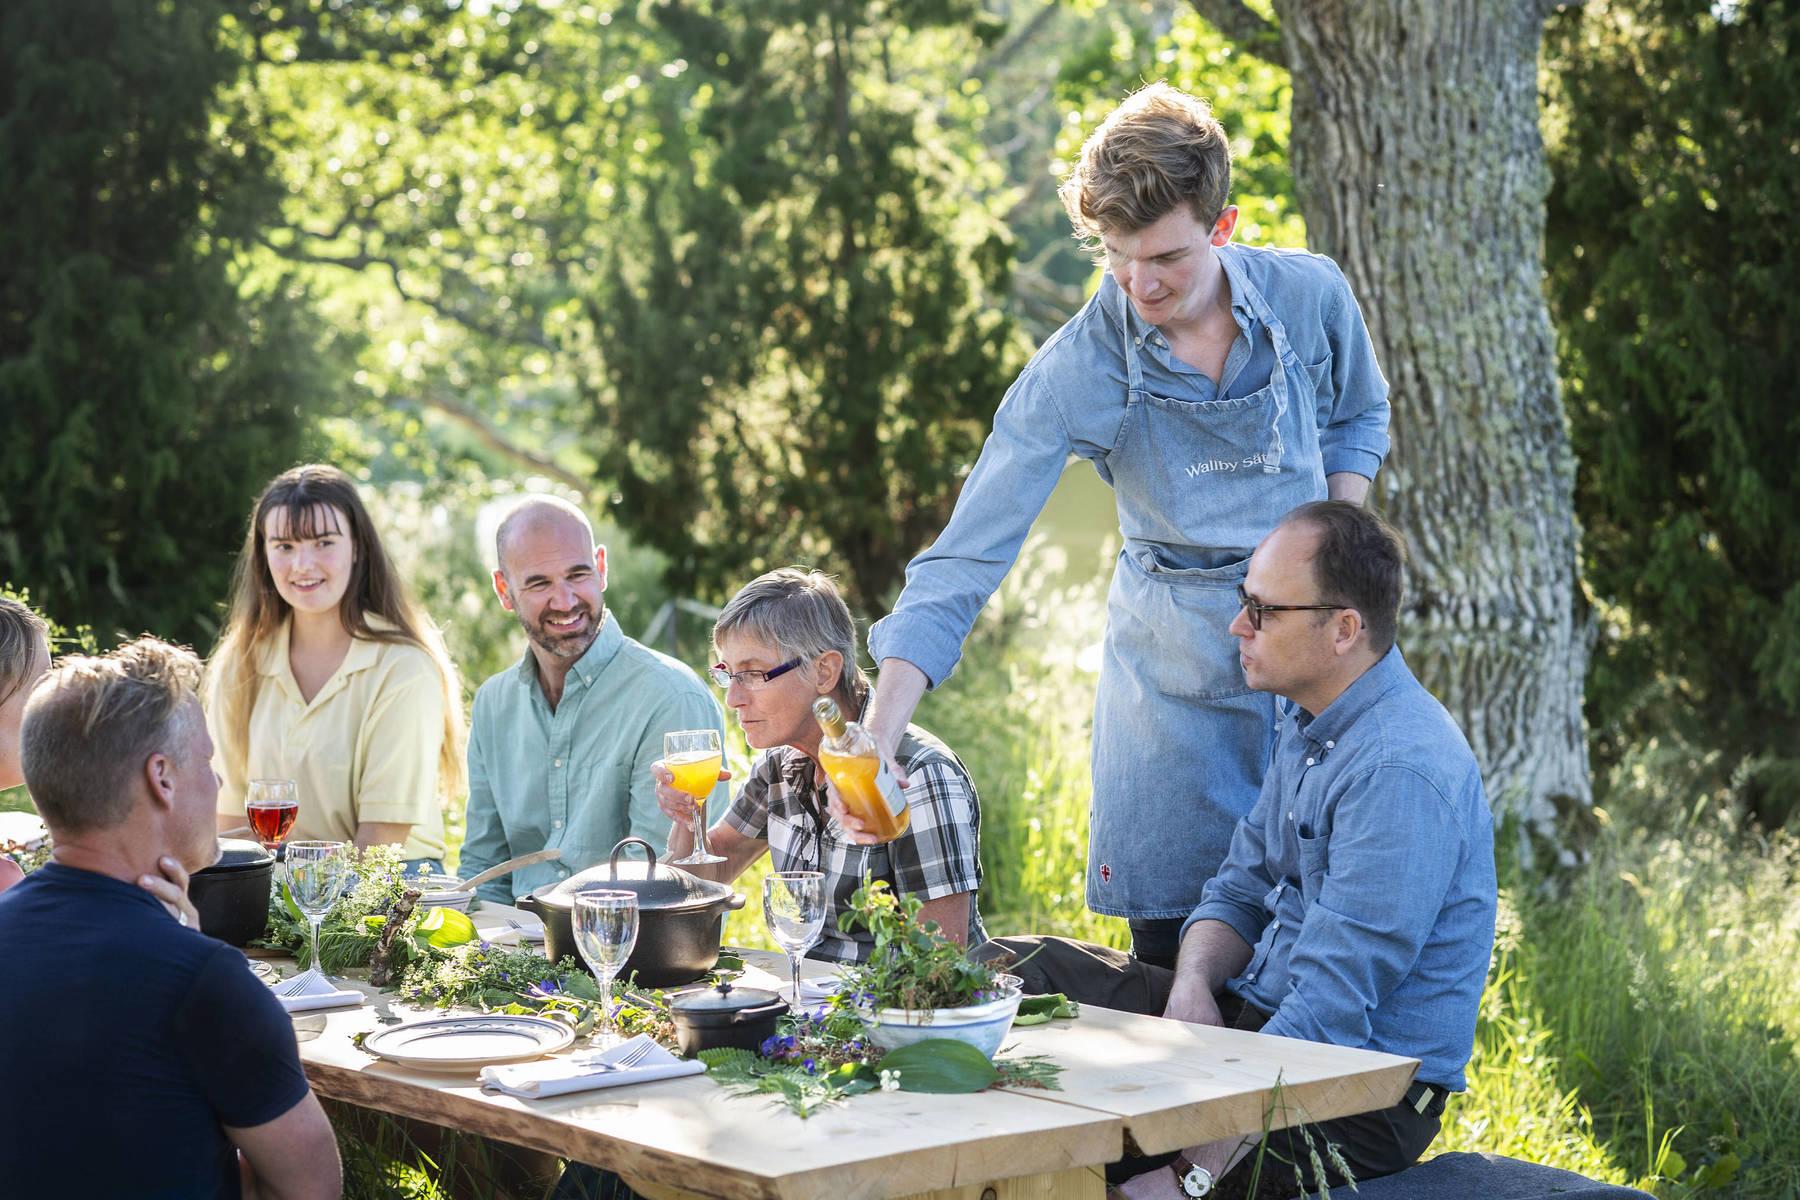 Enjoy the meal at Wallby Säteri